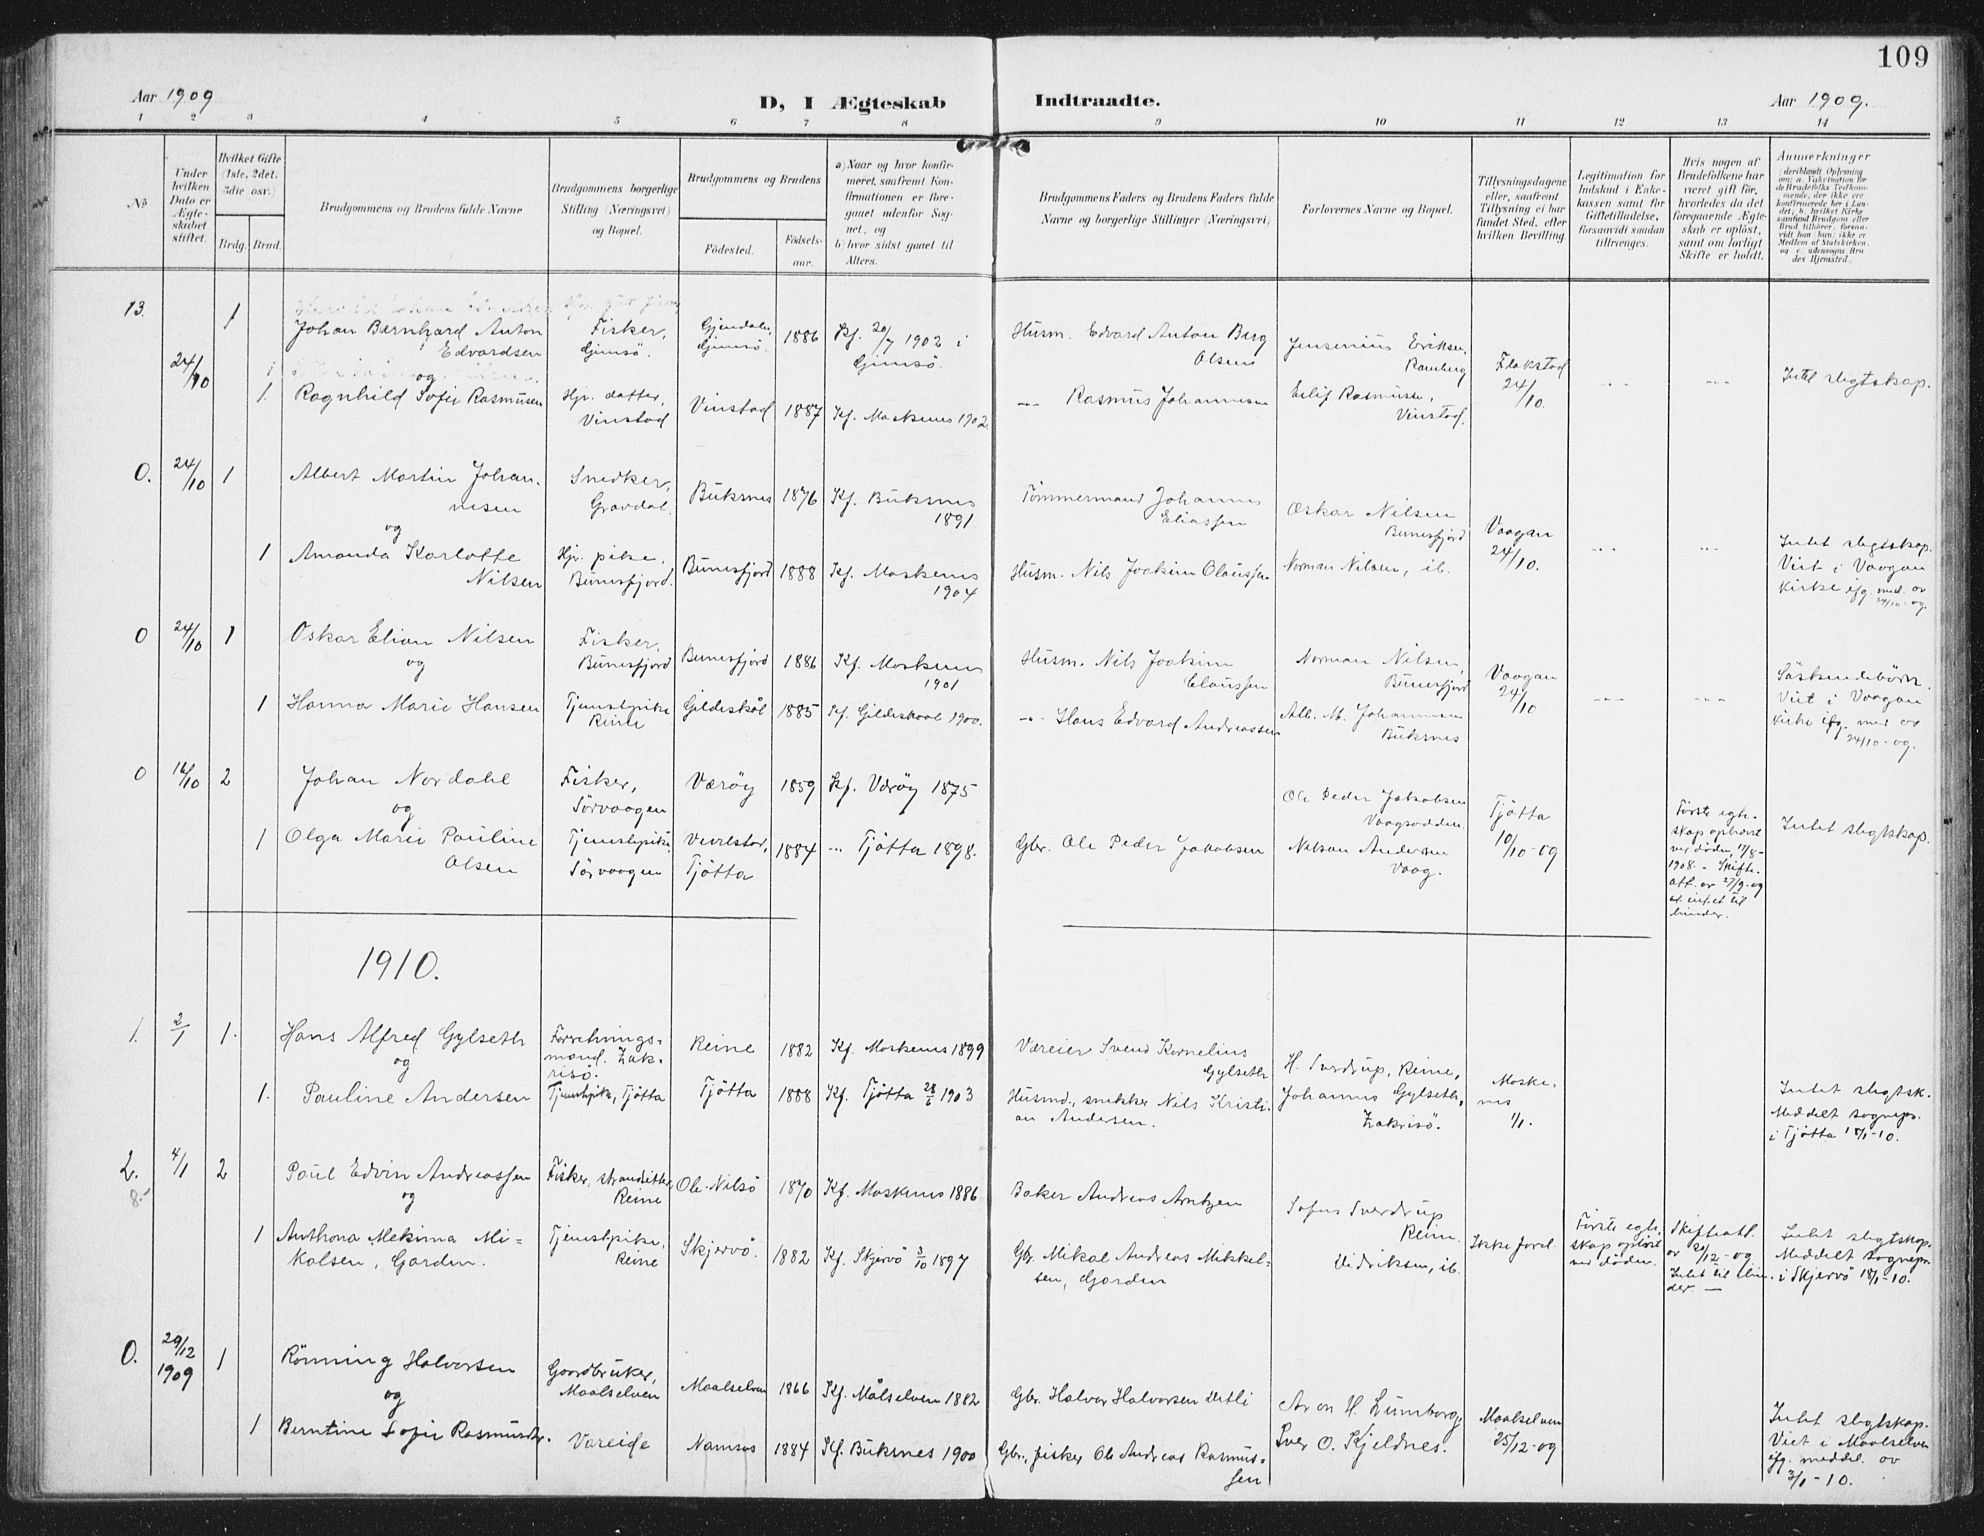 SAT, Ministerialprotokoller, klokkerbøker og fødselsregistre - Nordland, 886/L1221: Ministerialbok nr. 886A03, 1903-1913, s. 109